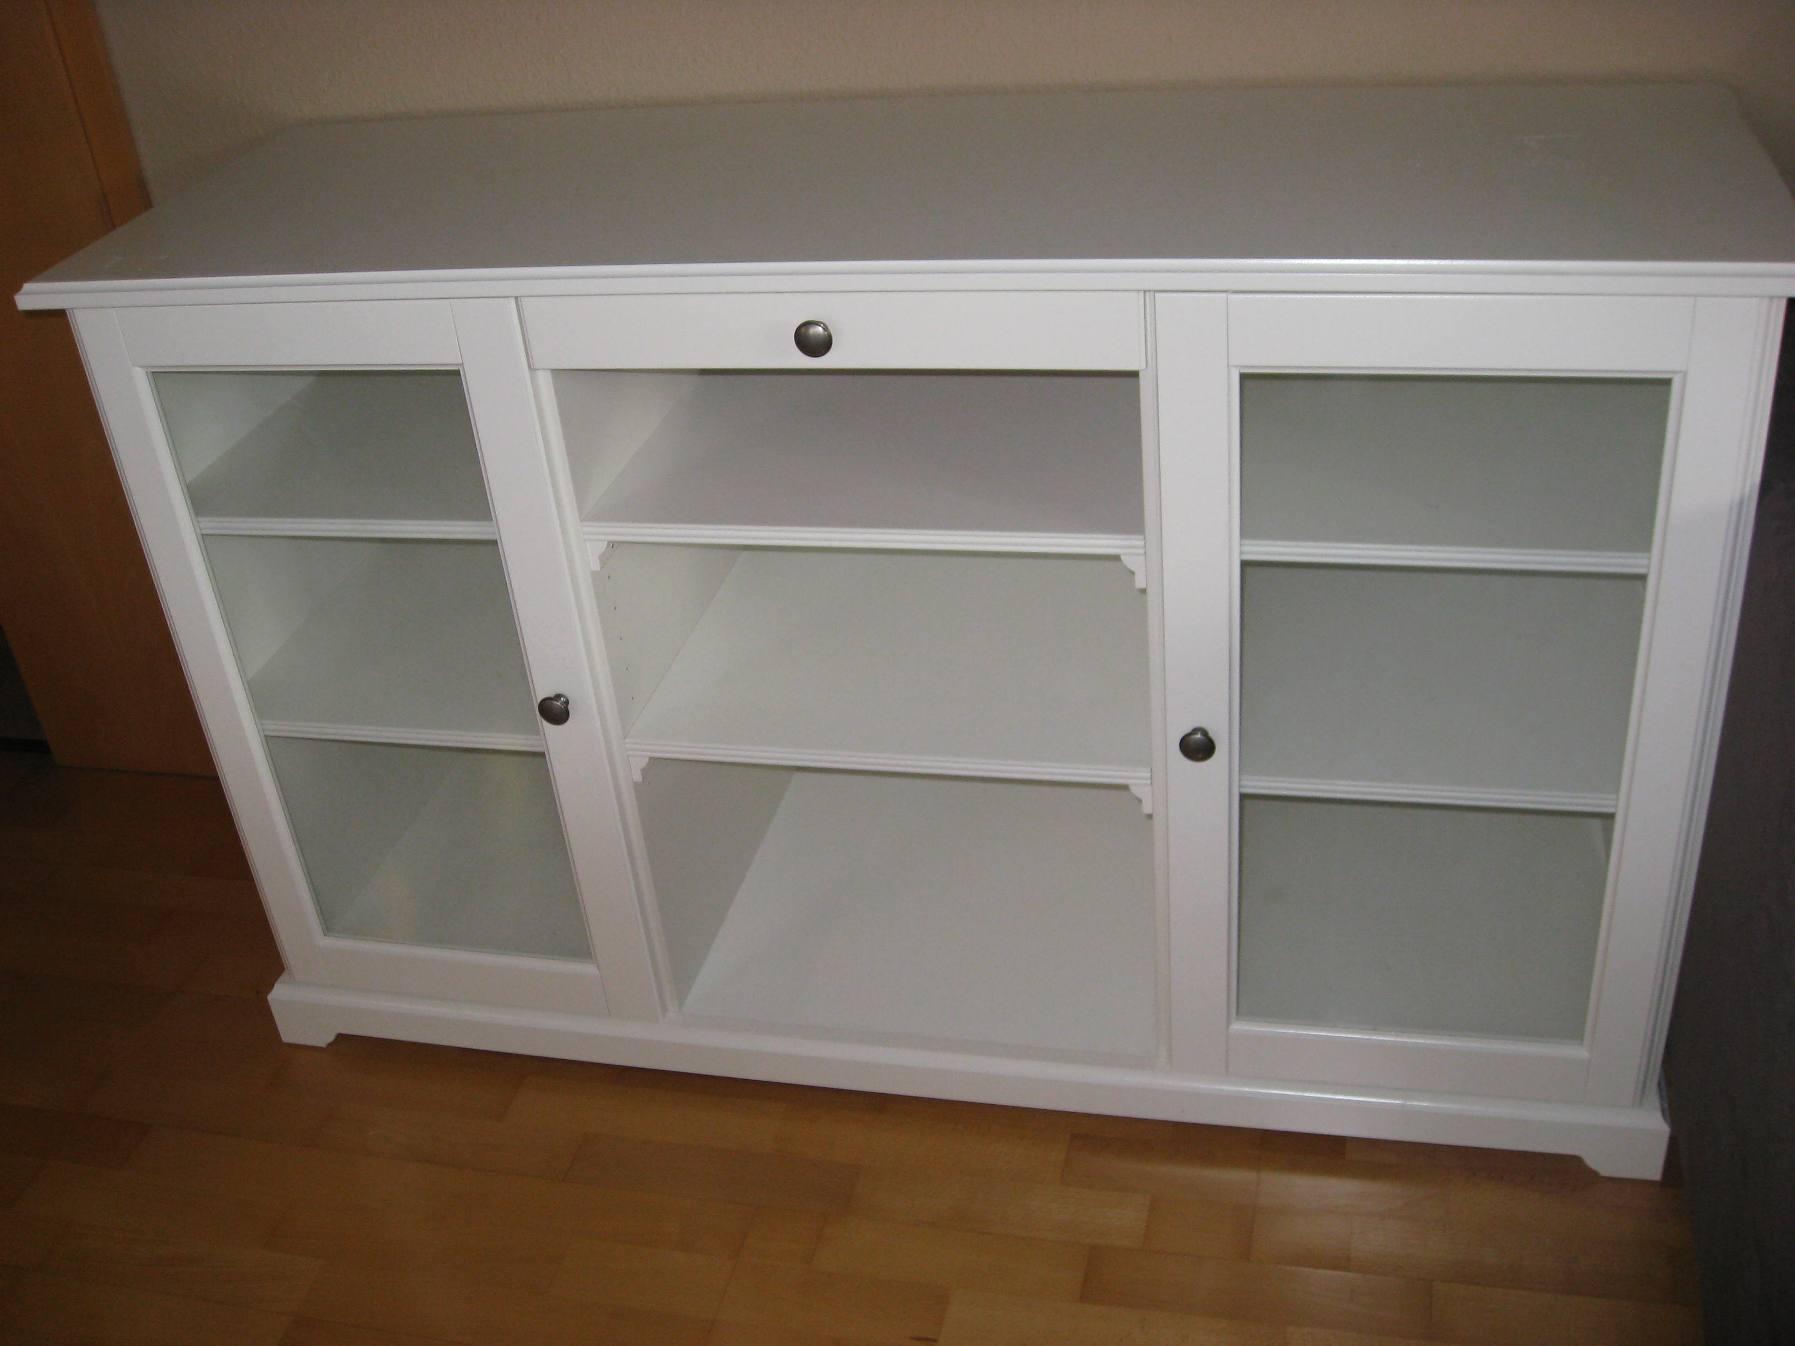 Ikea schrank weiß sideboard  Ikea Schrank Kommode | Ifmore